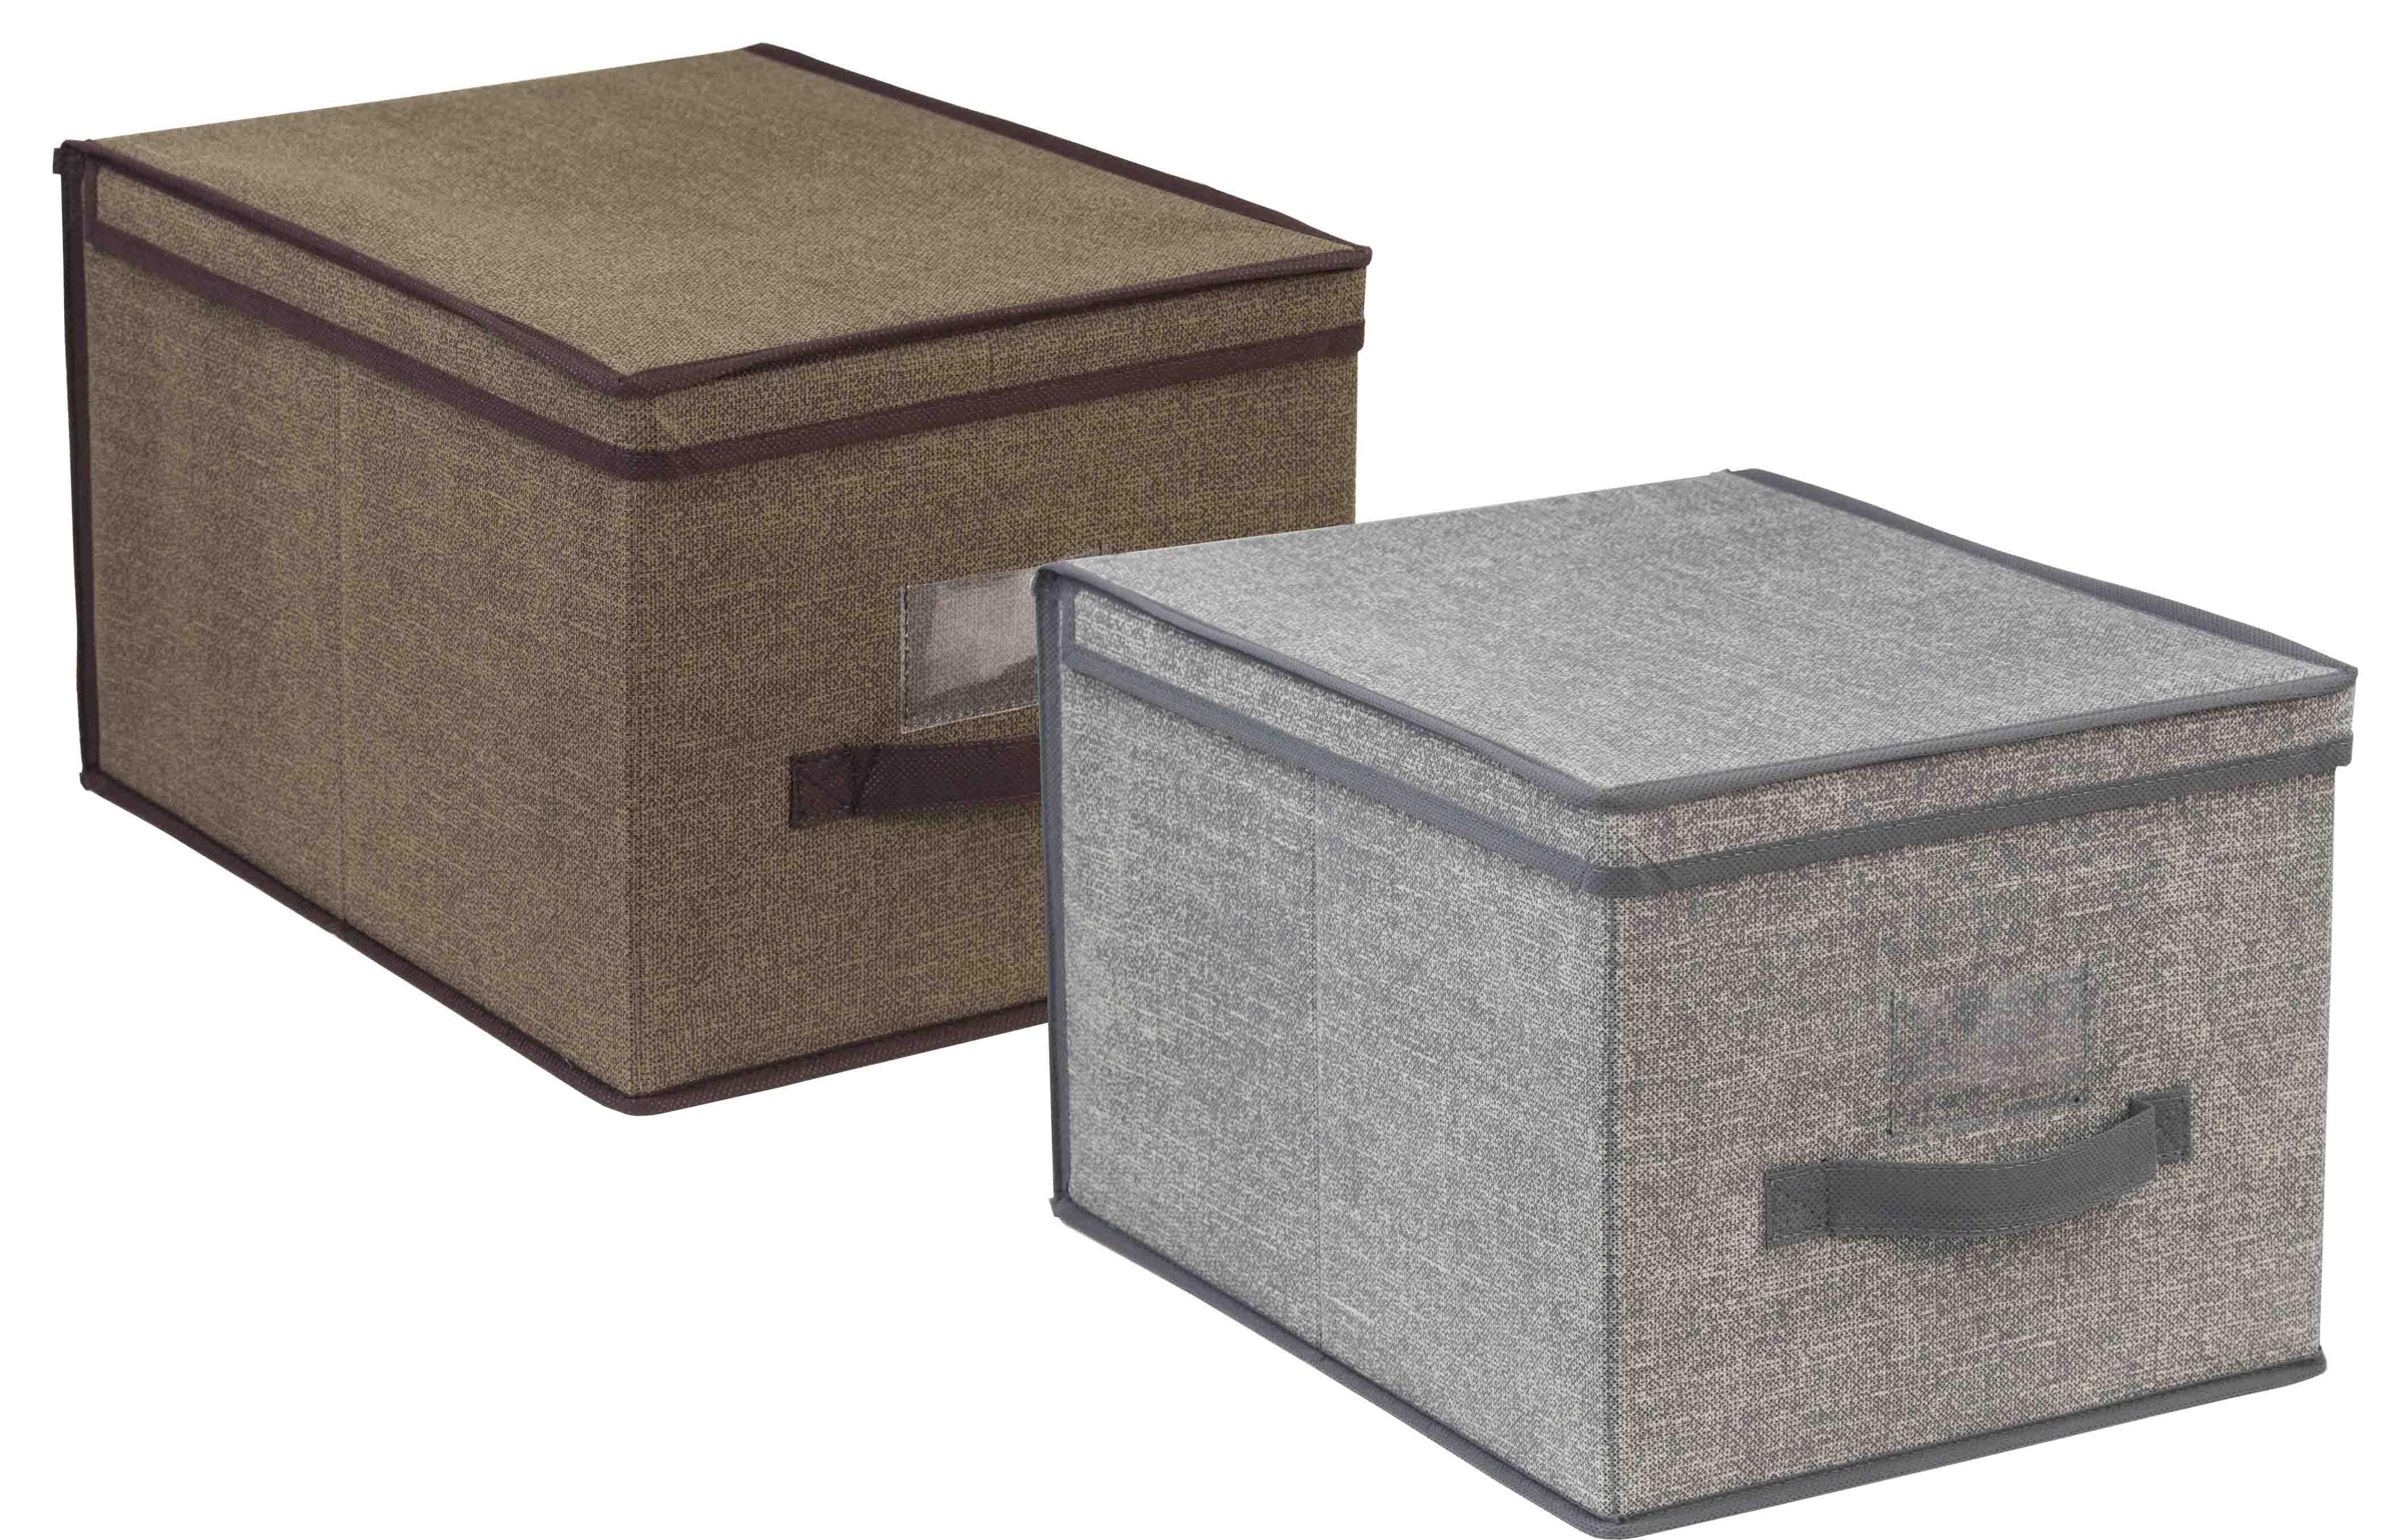 sc 1 st  Wayfair & Rebrilliant Jute Handle Storage Box u0026 Reviews   Wayfair